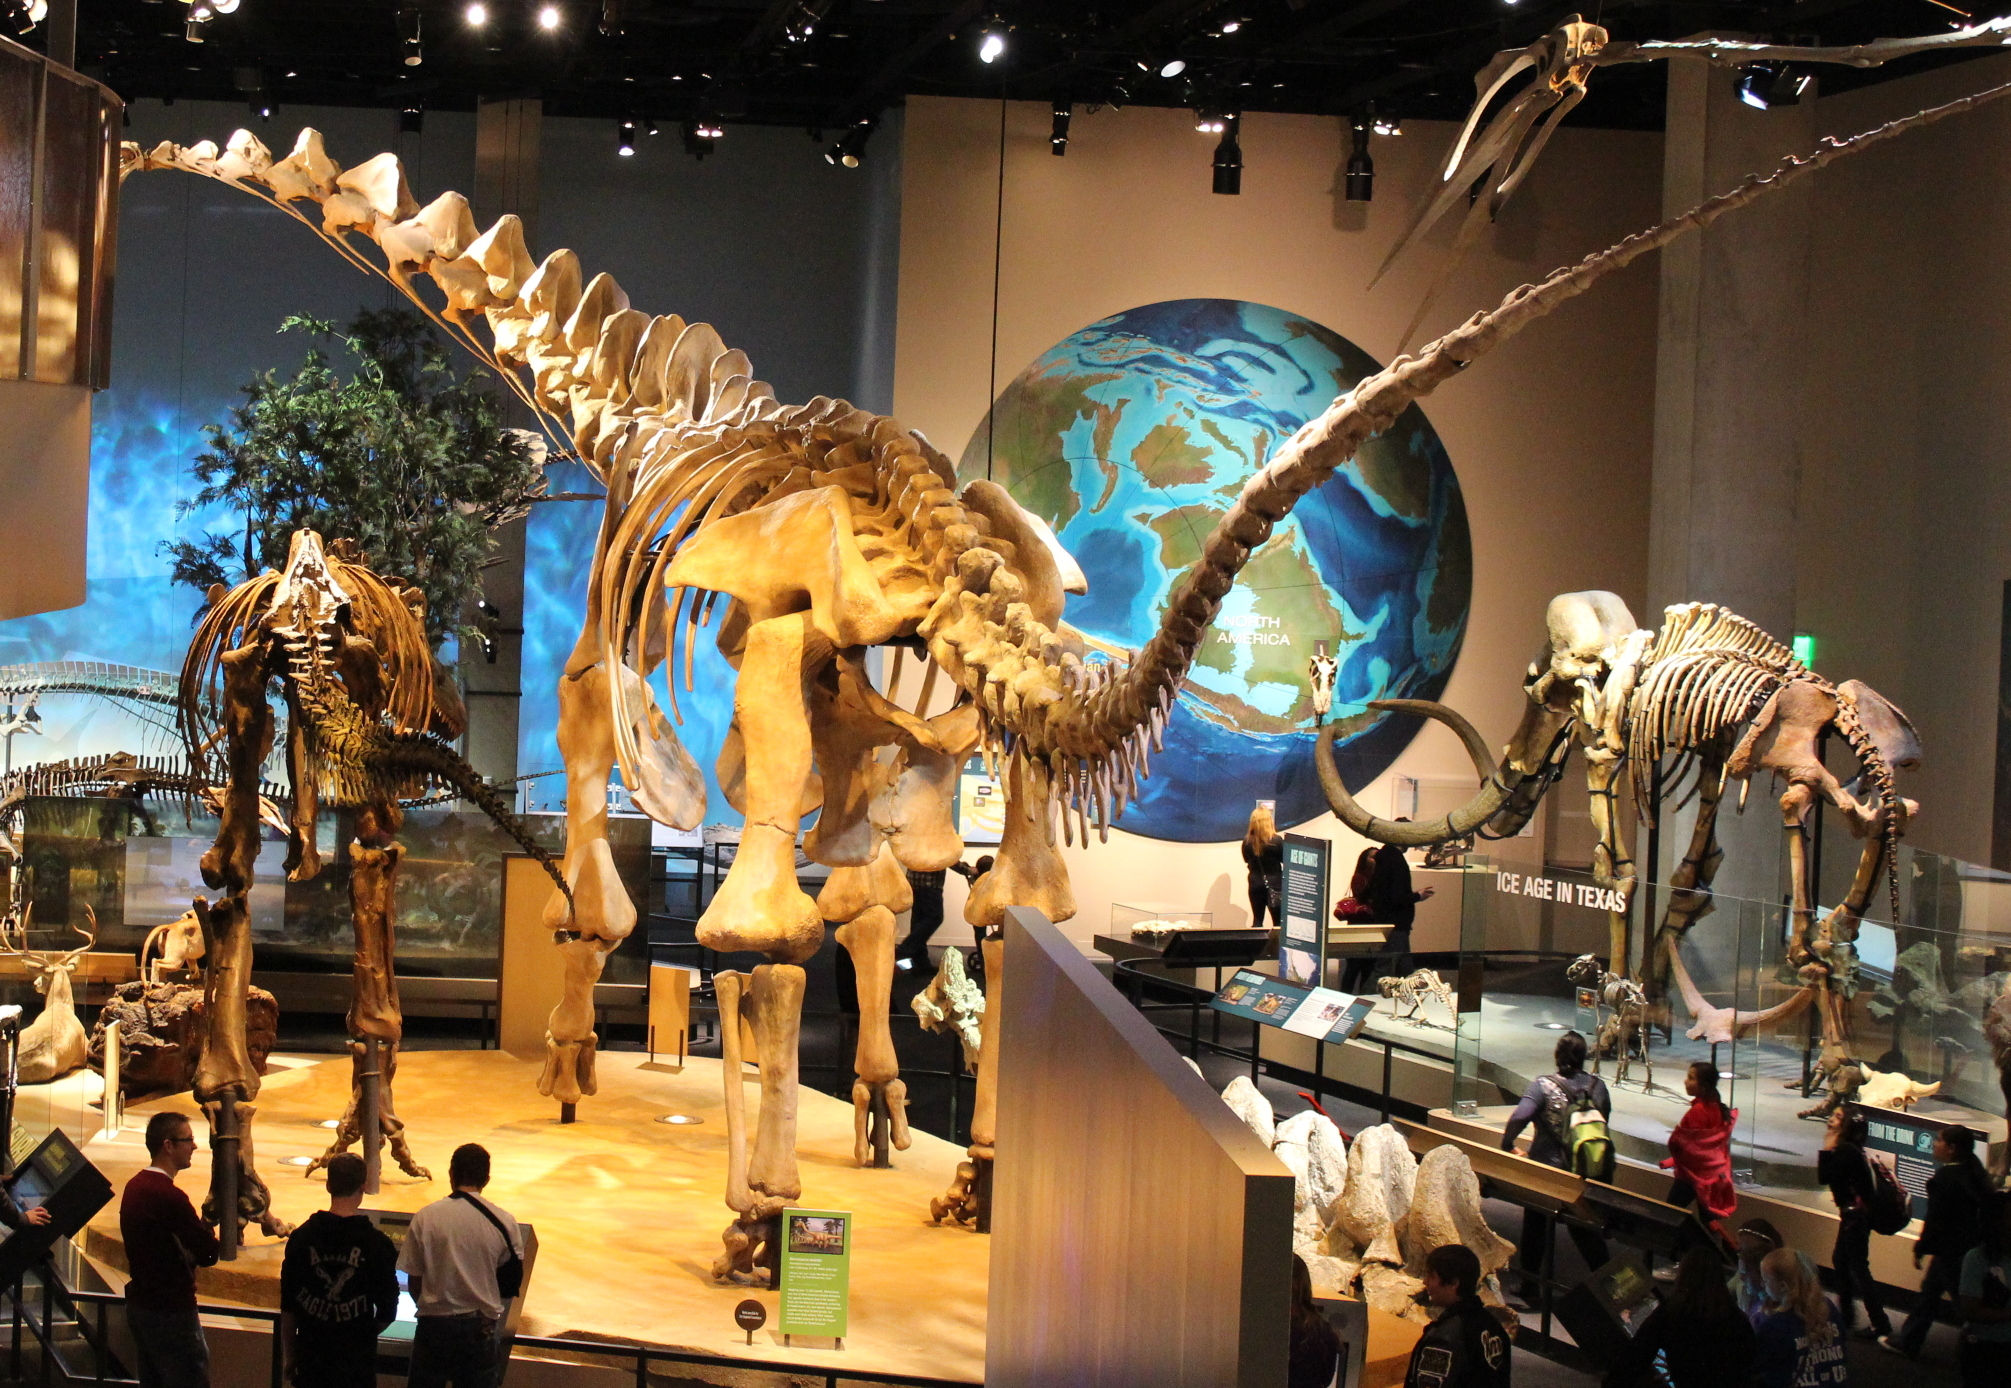 FilePerot Museum Alamosaurusjpg FilePerot Museum Alamosaurusjpg